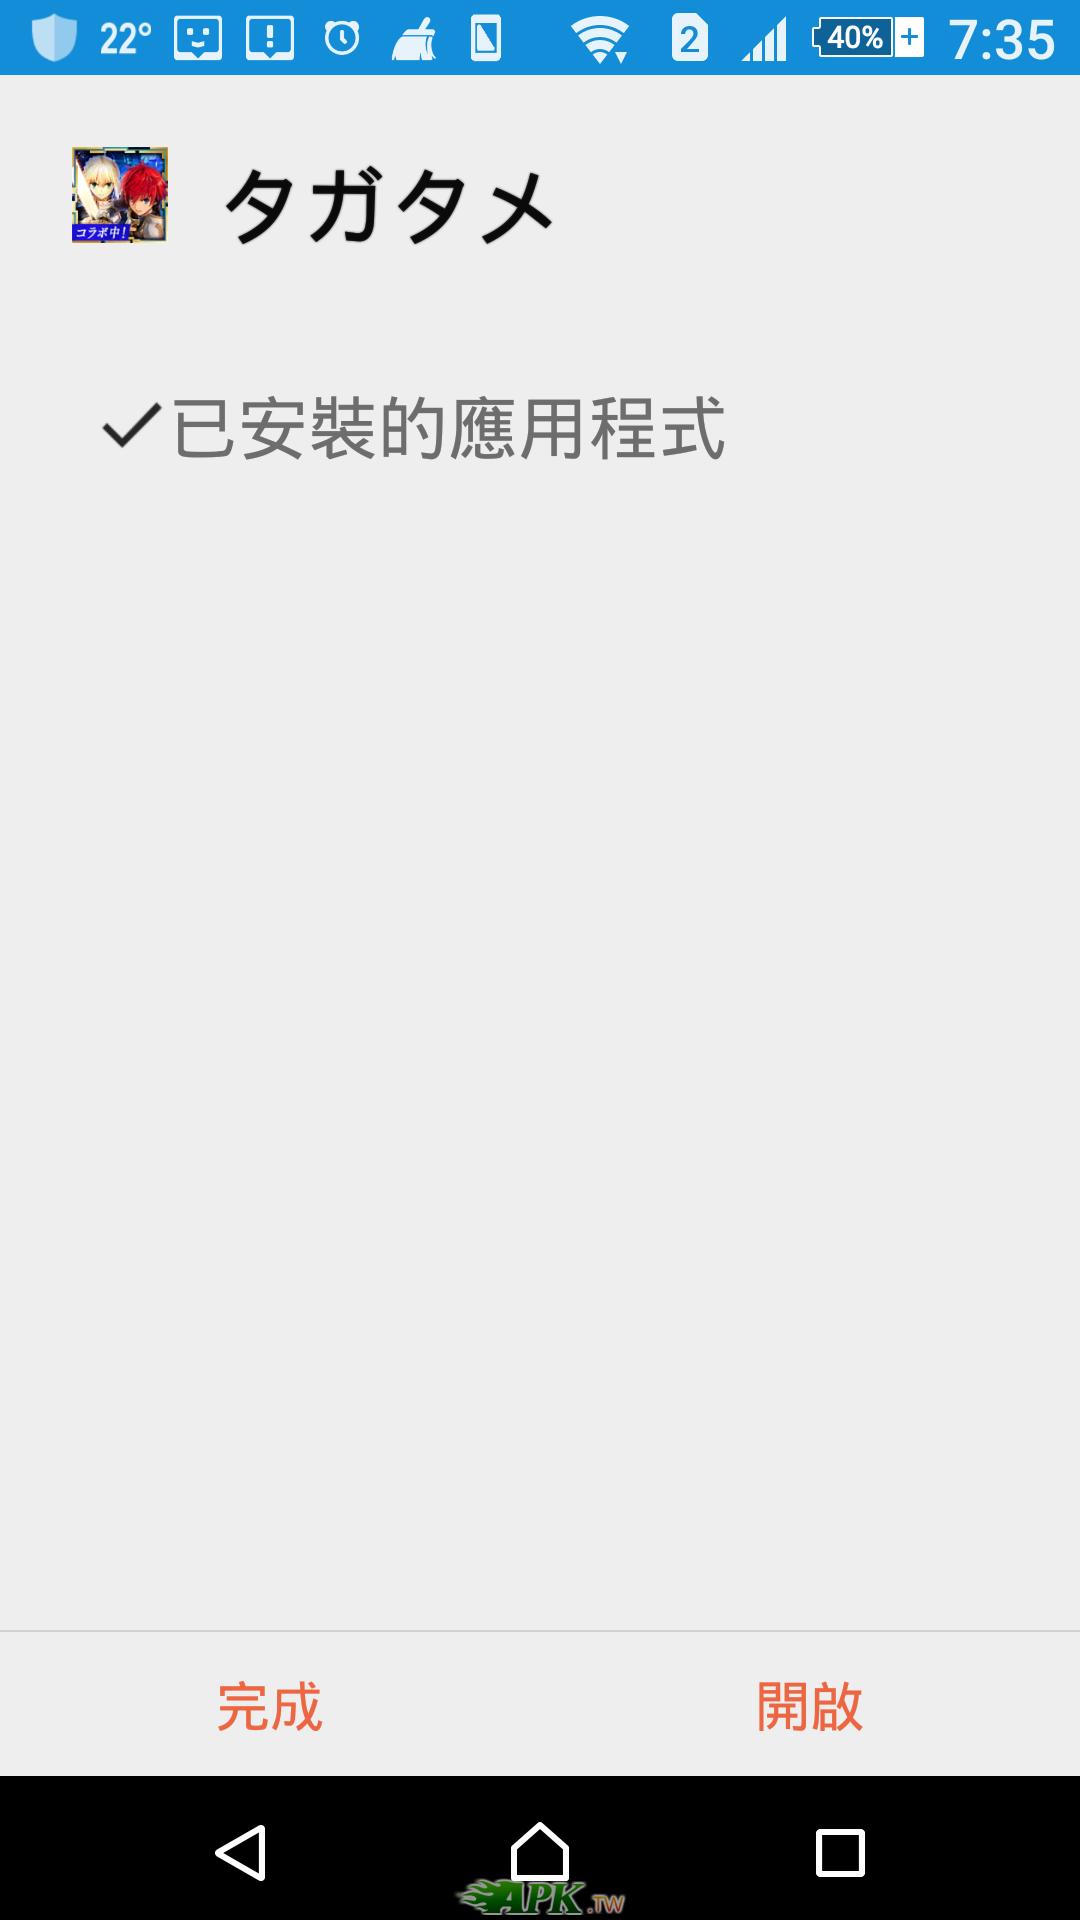 Screenshot_2017-01-05-19-35-46.png